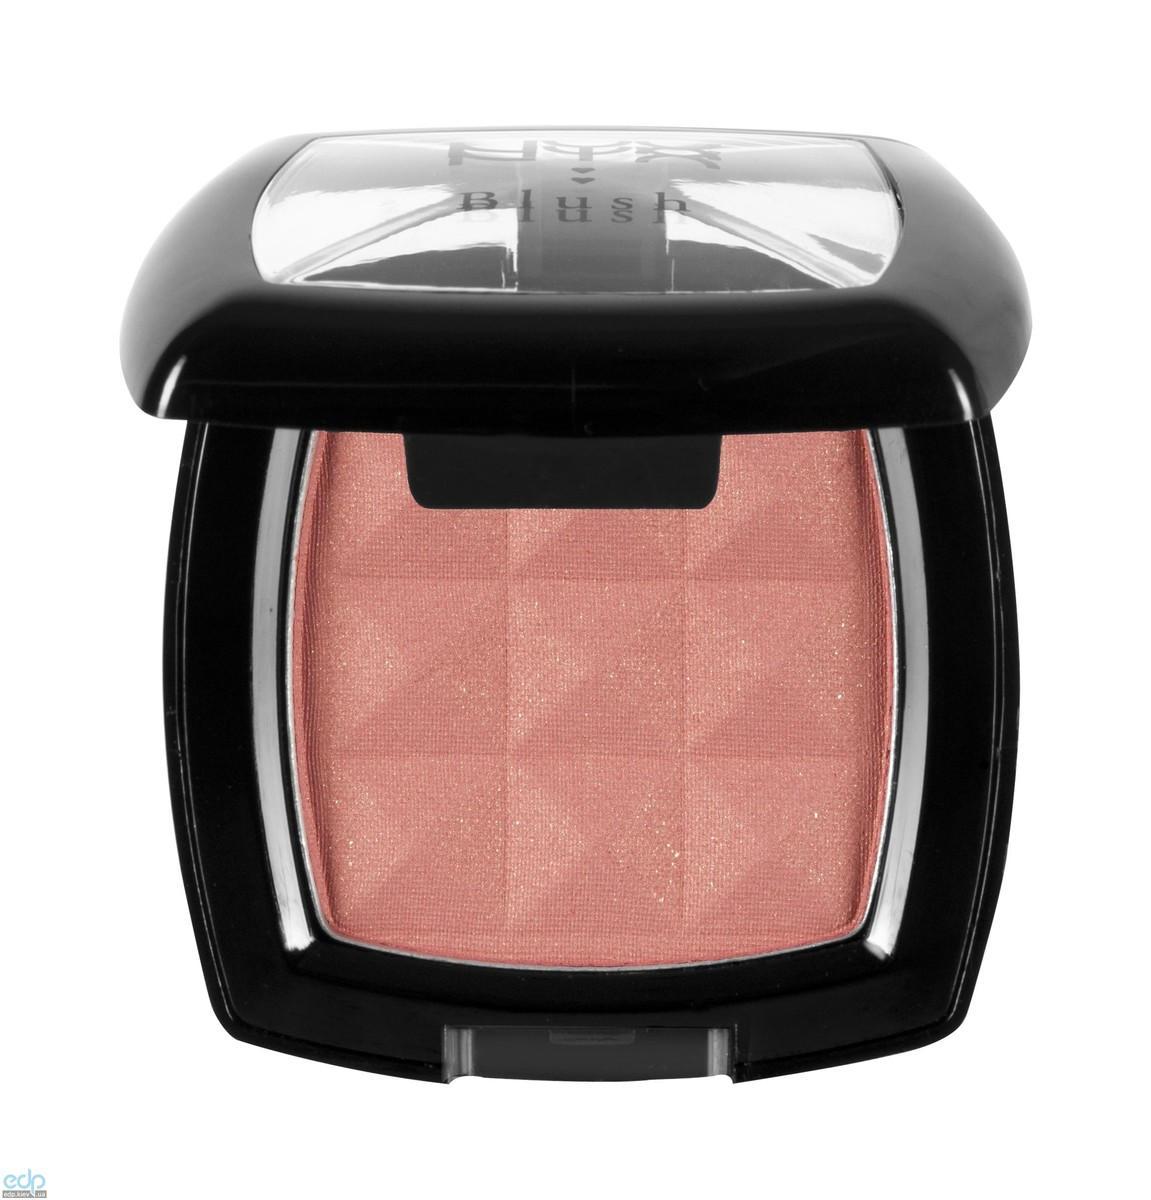 NYX - Компактные румяна Nyx Powder Blush теплый розовый с золотым отливом Ethereal PB33 - 4 g